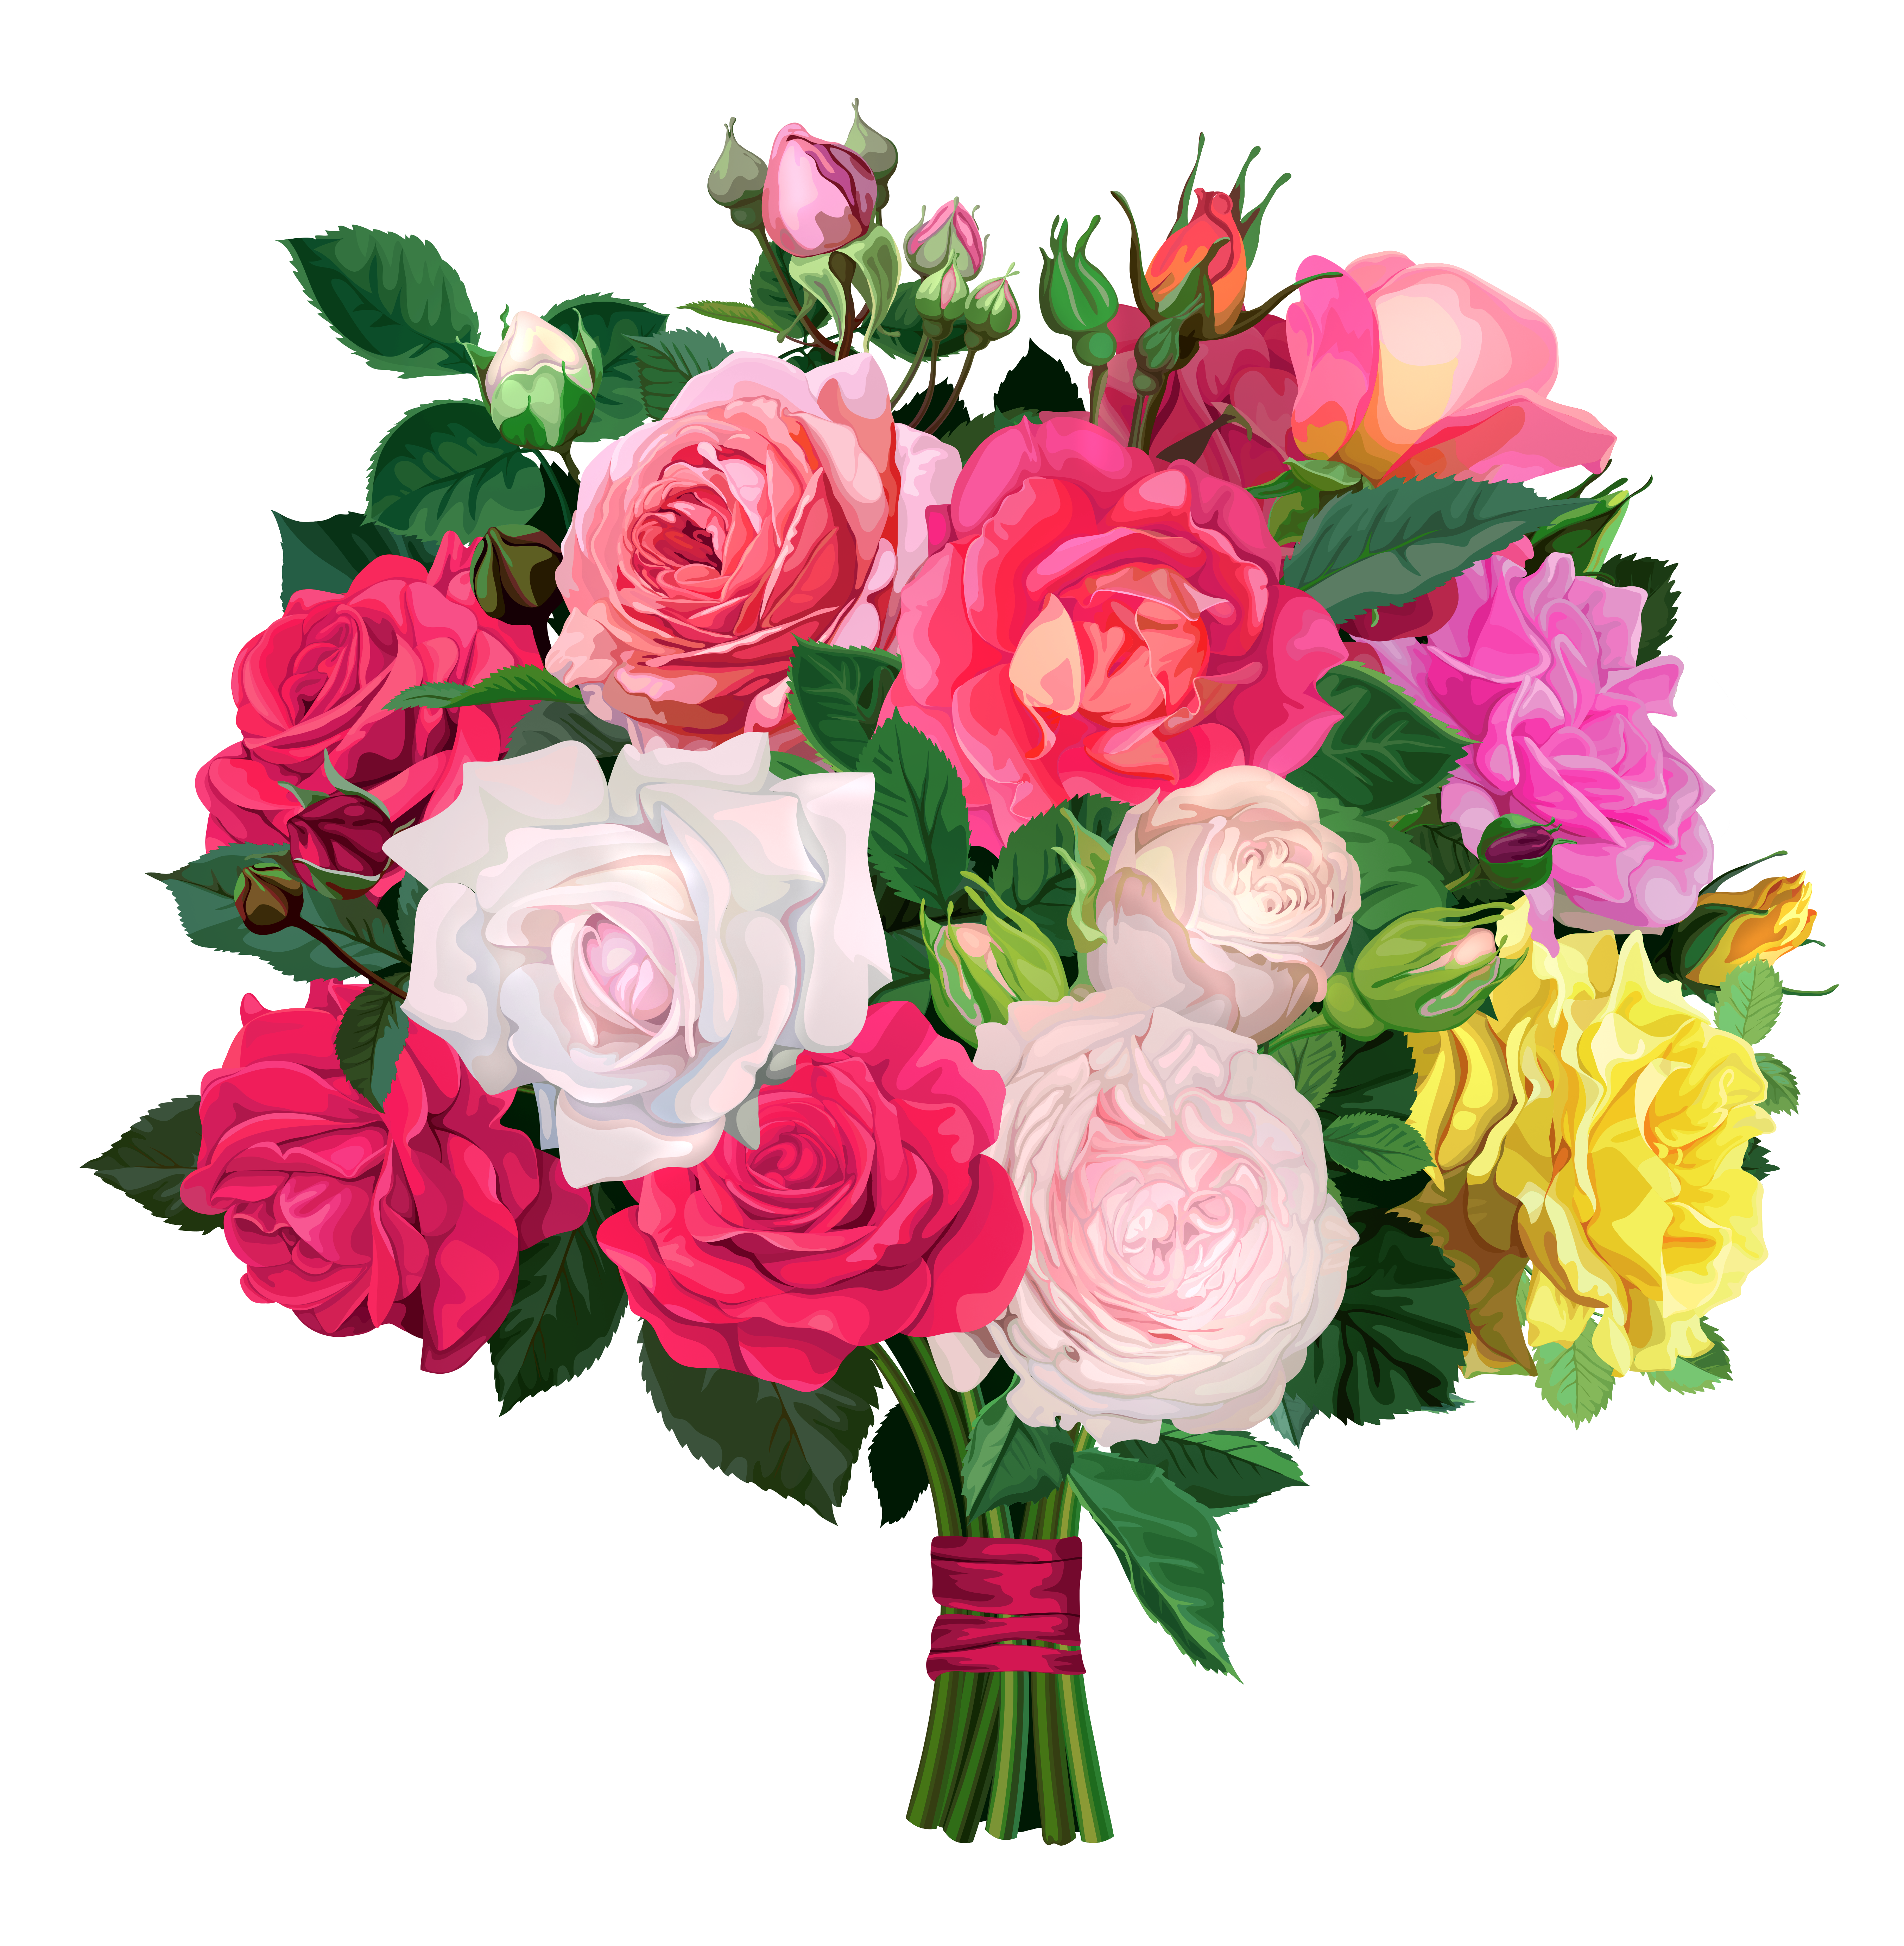 Rose bouquet png transparent. Clipart roses modern